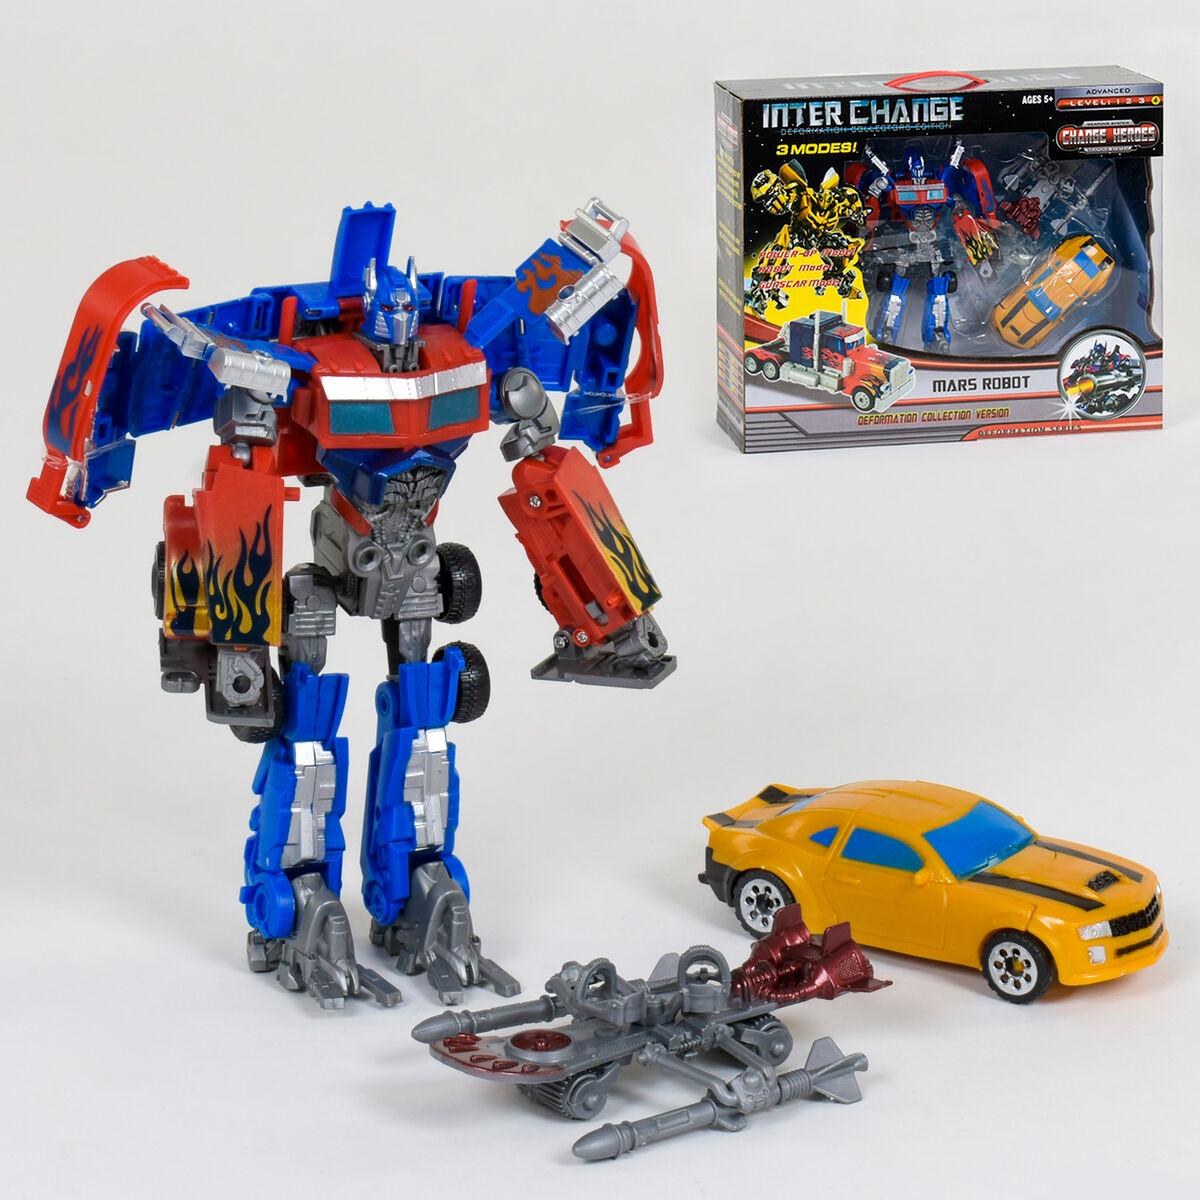 Набор трансформеров Оптимус Прайм и Бамблби Transformers Inter Chane Optimus Prime